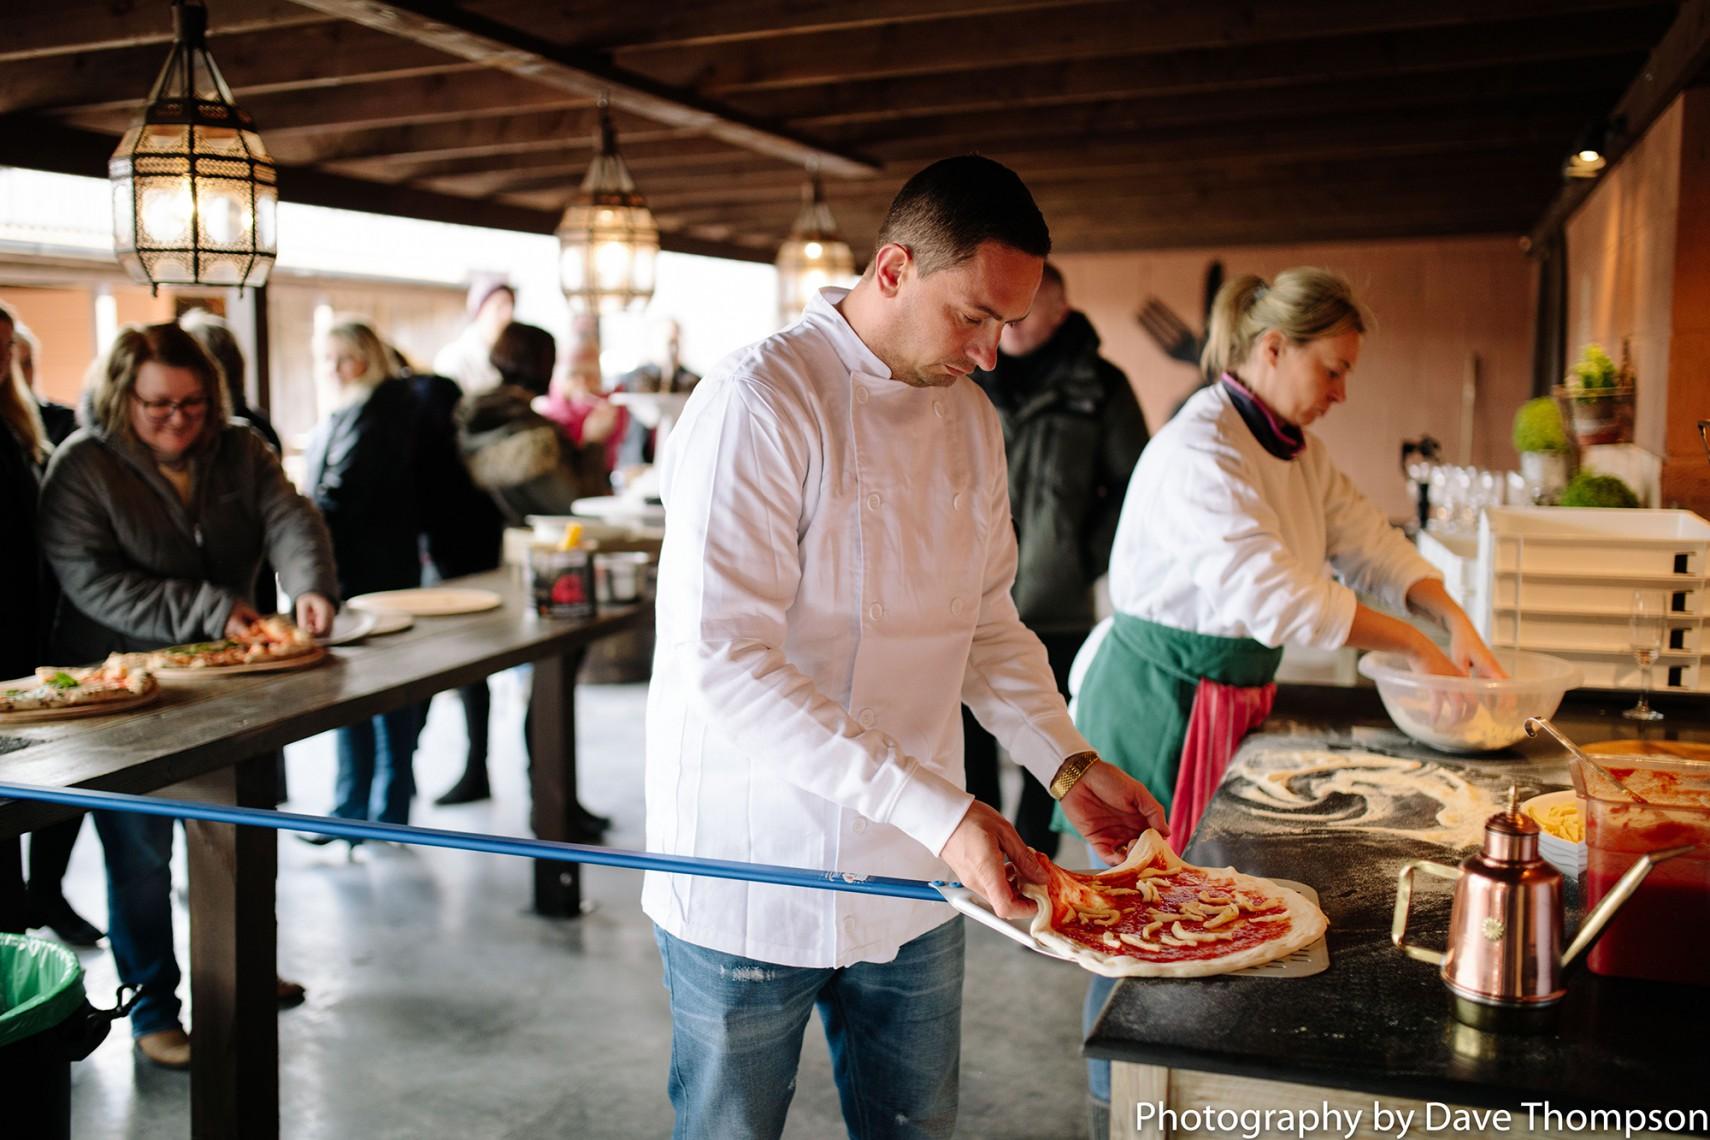 Pizza is prepared at Alcumlow Wedding Barn